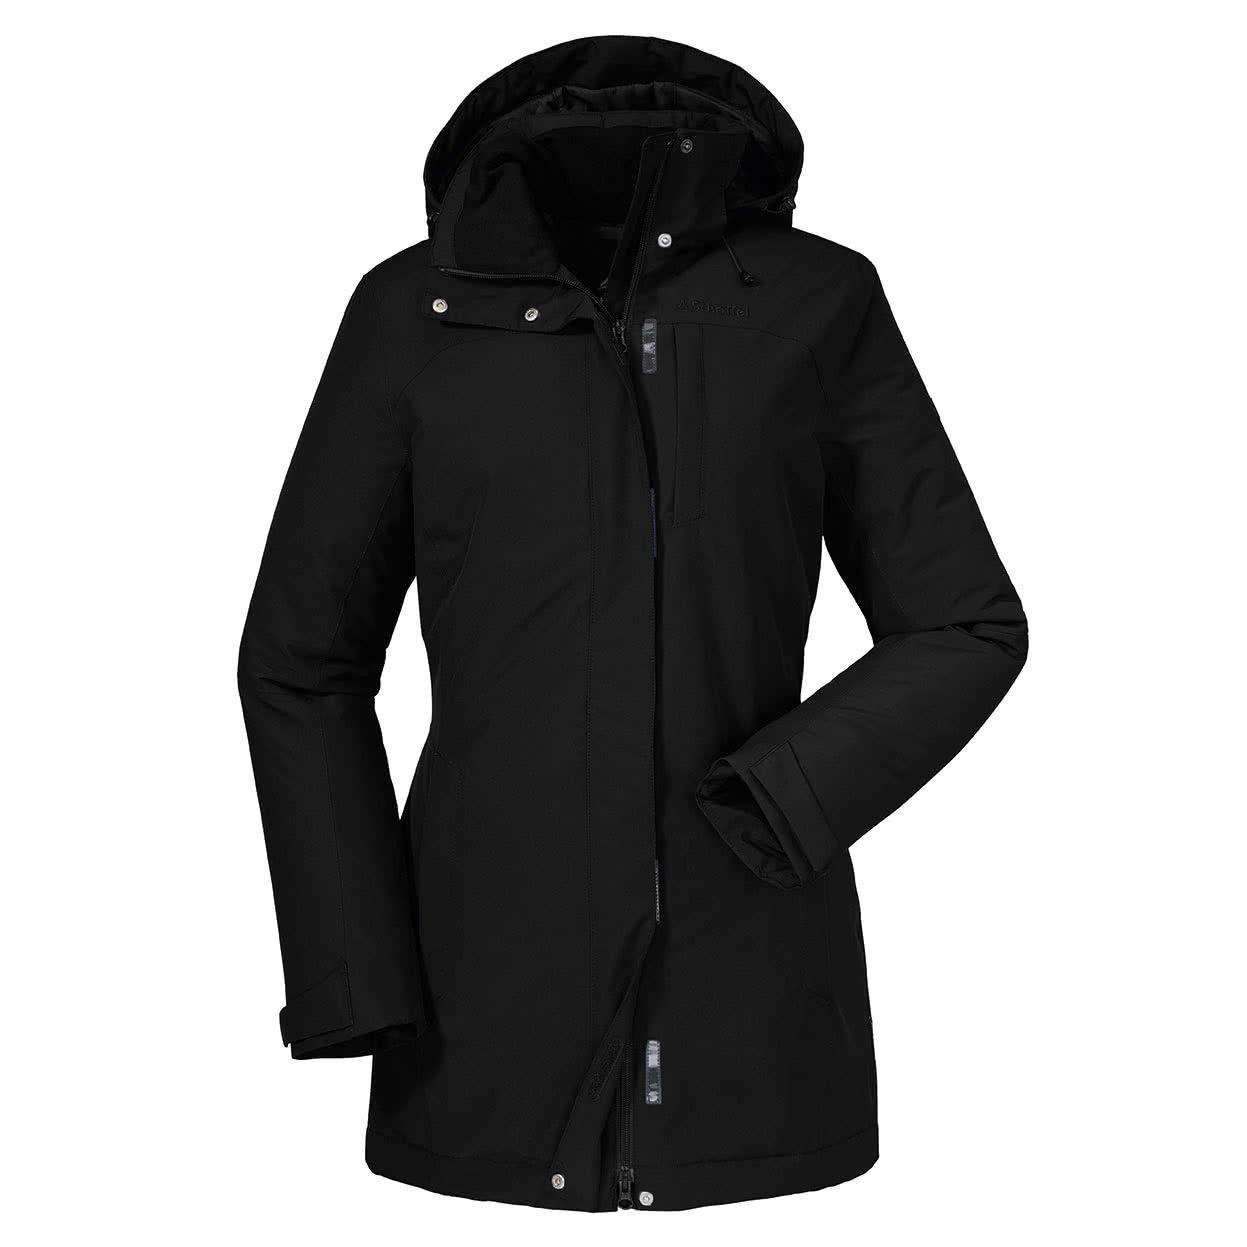 Schöffel Damen Insulated Jacket Portillo Jacke